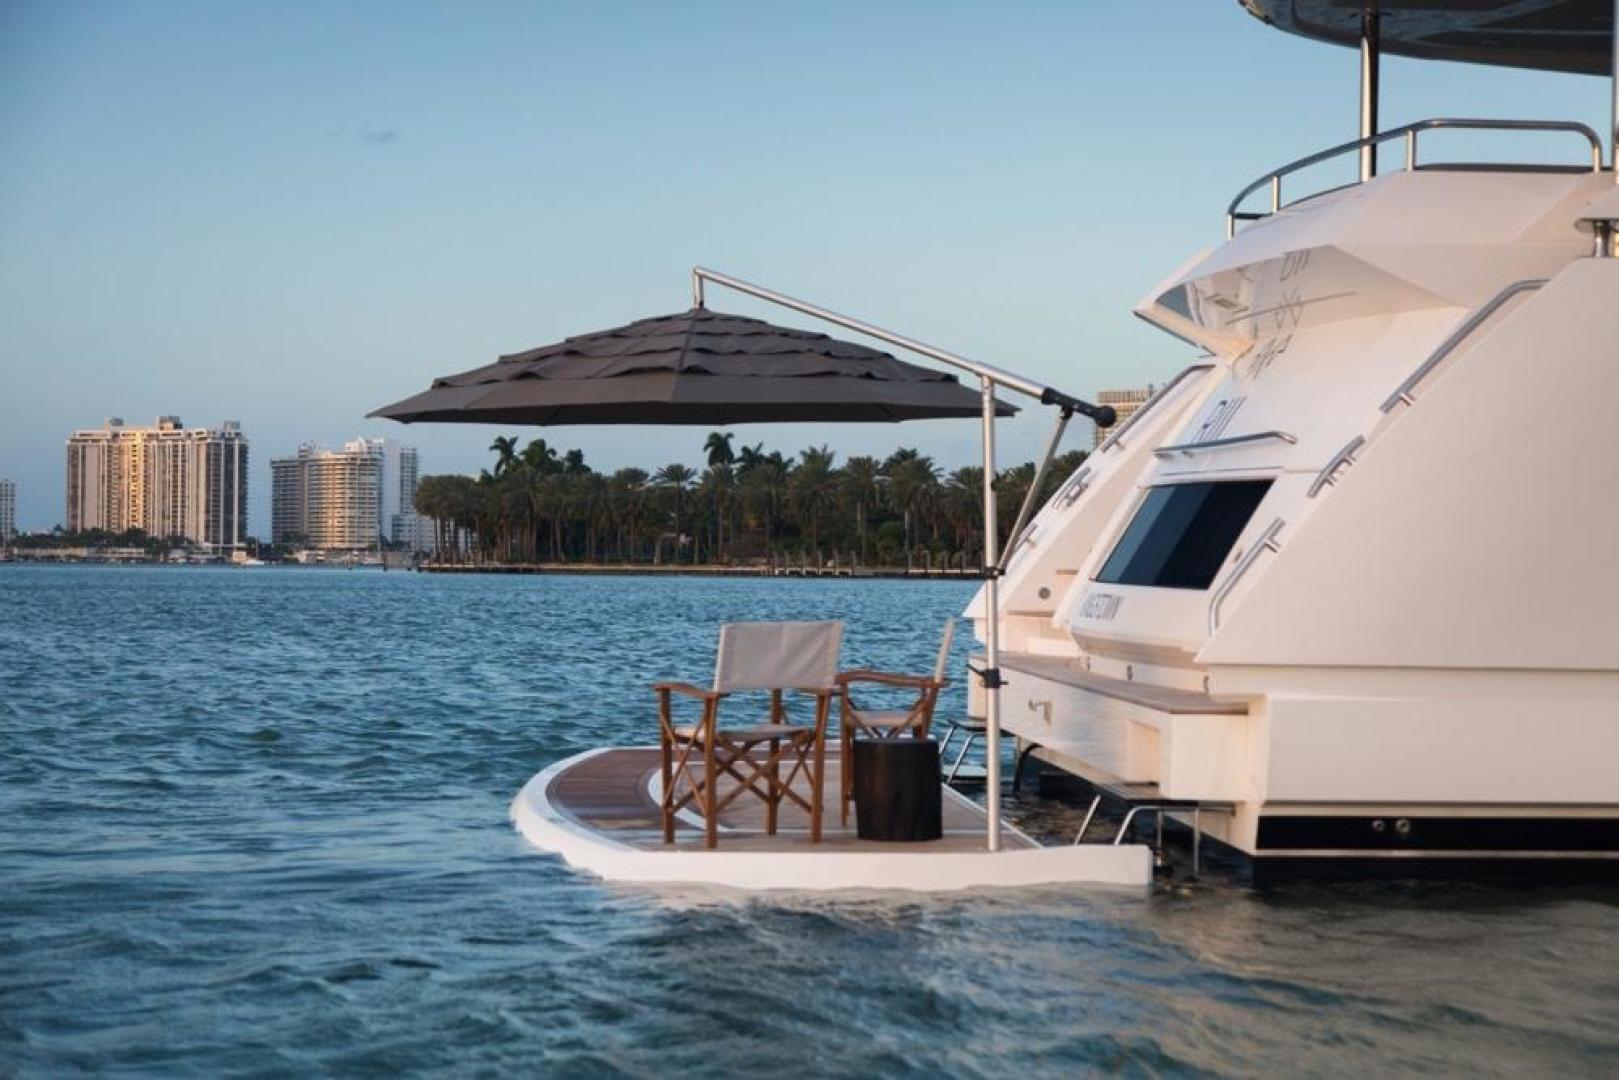 Sunseeker-28 Metre Yacht 2016-RIII Miami-Florida-United States-2016 SUNSEEKER 92 RIII FOR SALE-600085 | Thumbnail